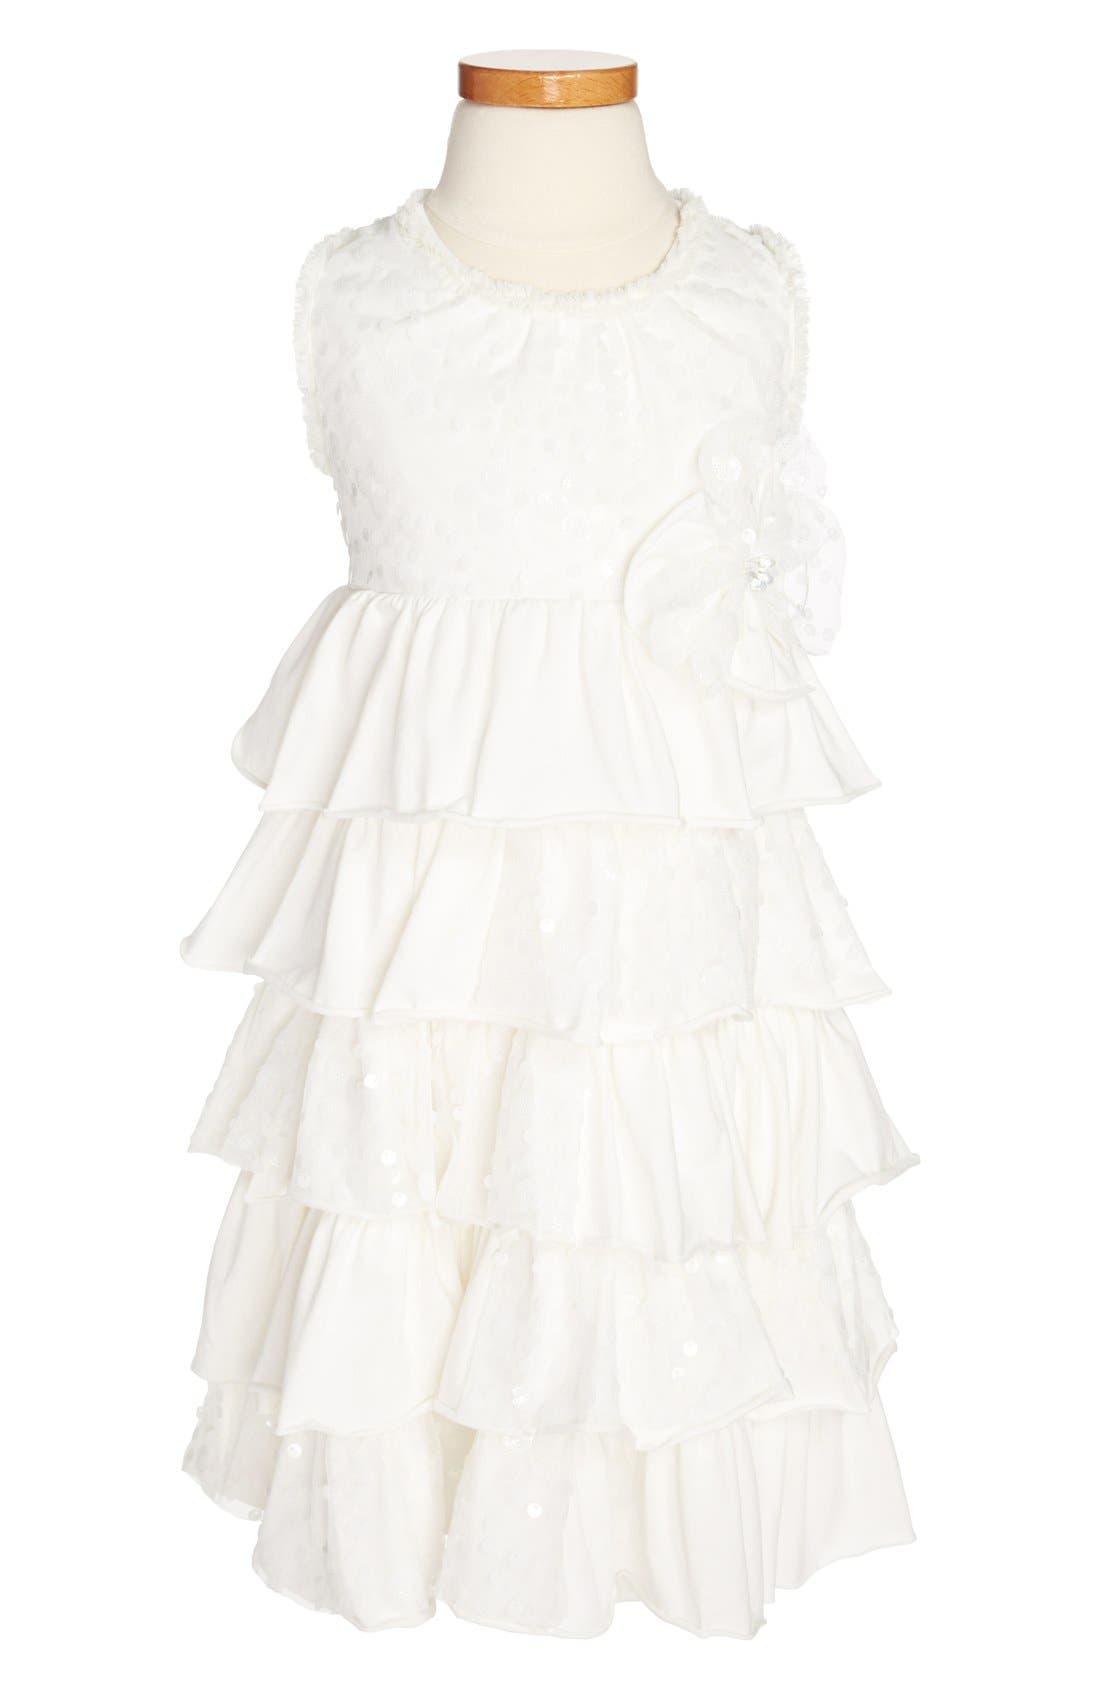 Main Image - Isobella & Chloe 'Enchanted' Dress (Little Girls & Big Girls)